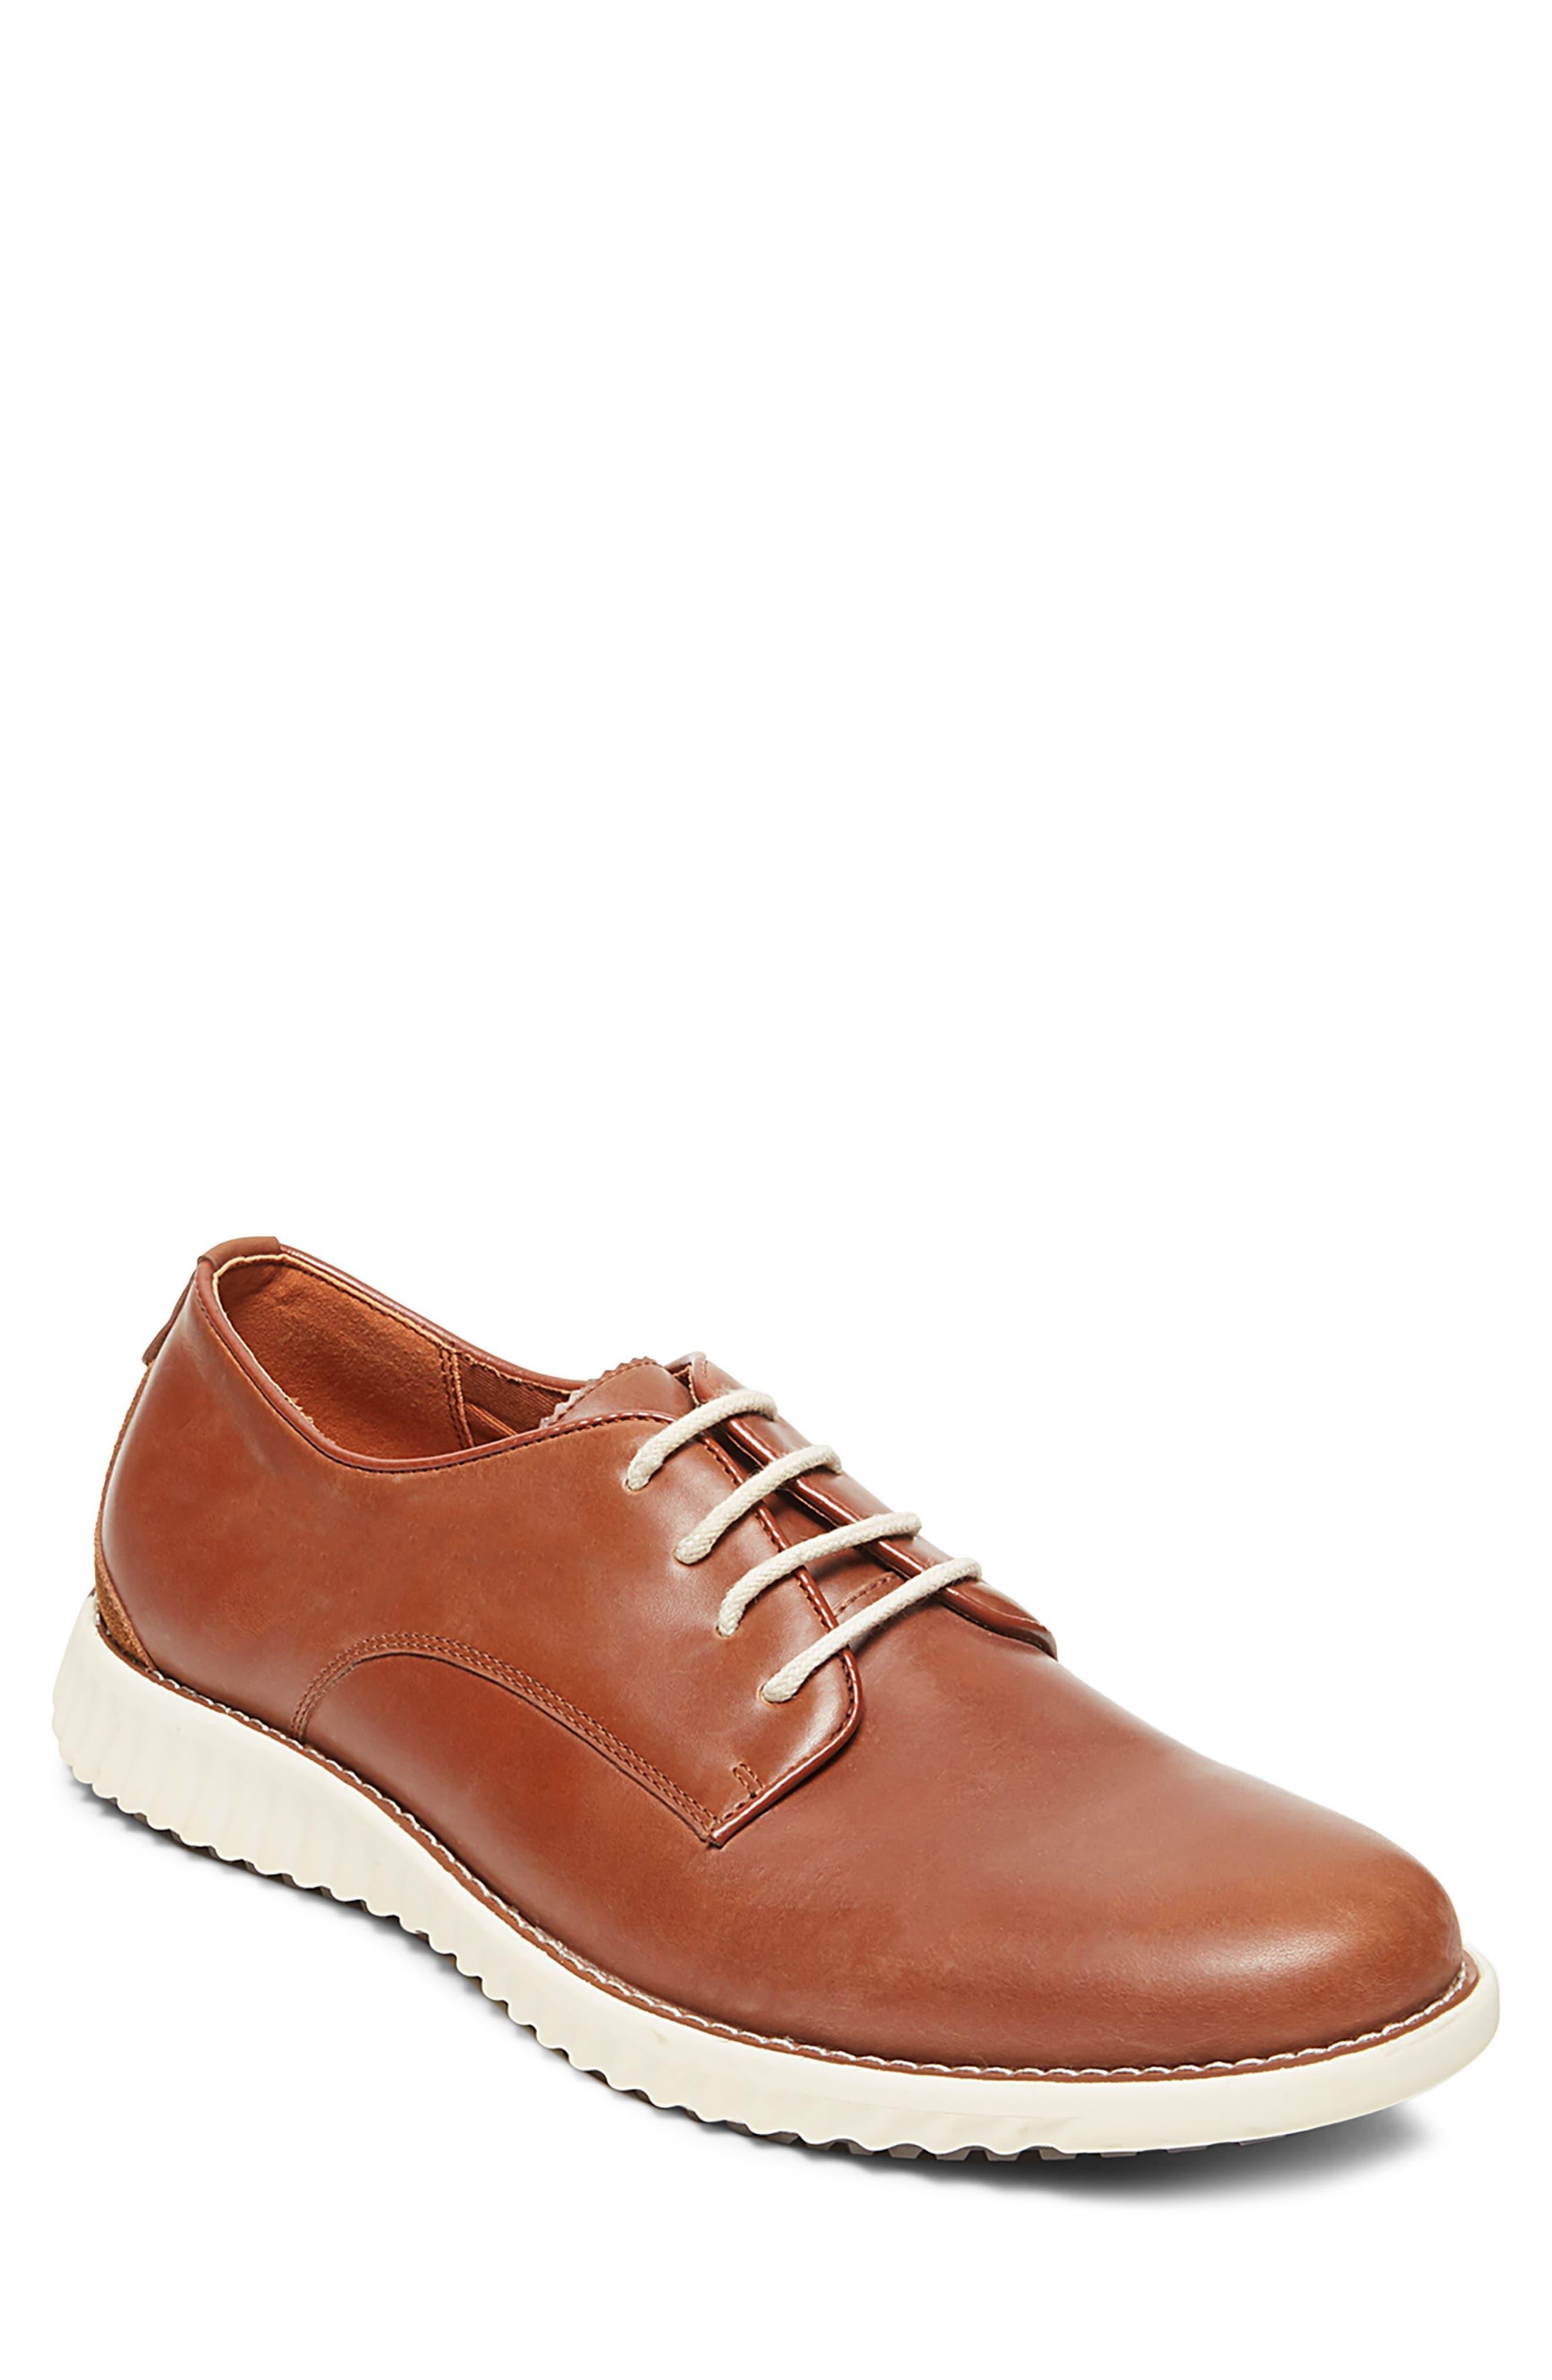 Vance Sneaker,                             Main thumbnail 1, color,                             203